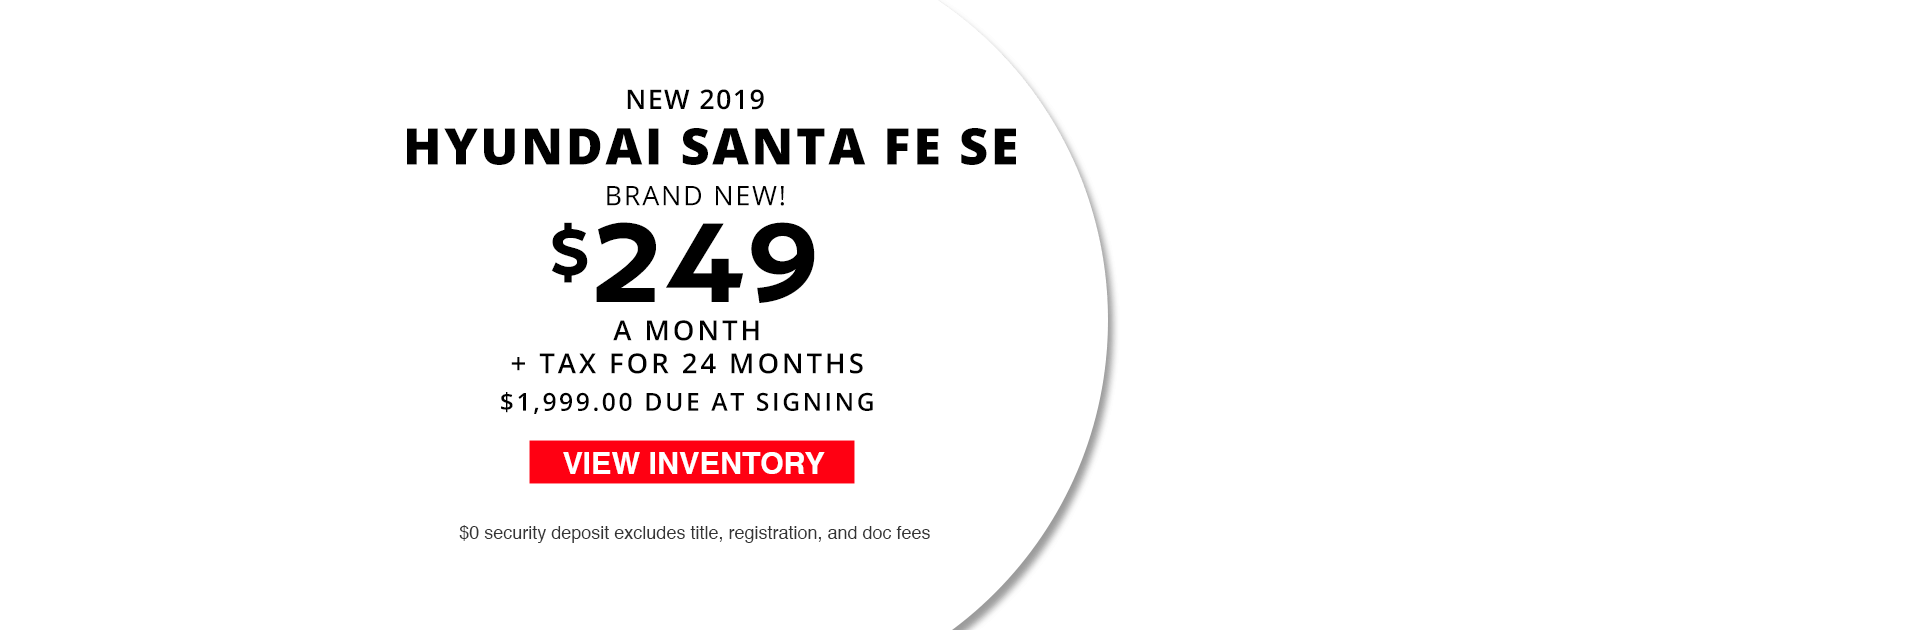 Santa Fe Video